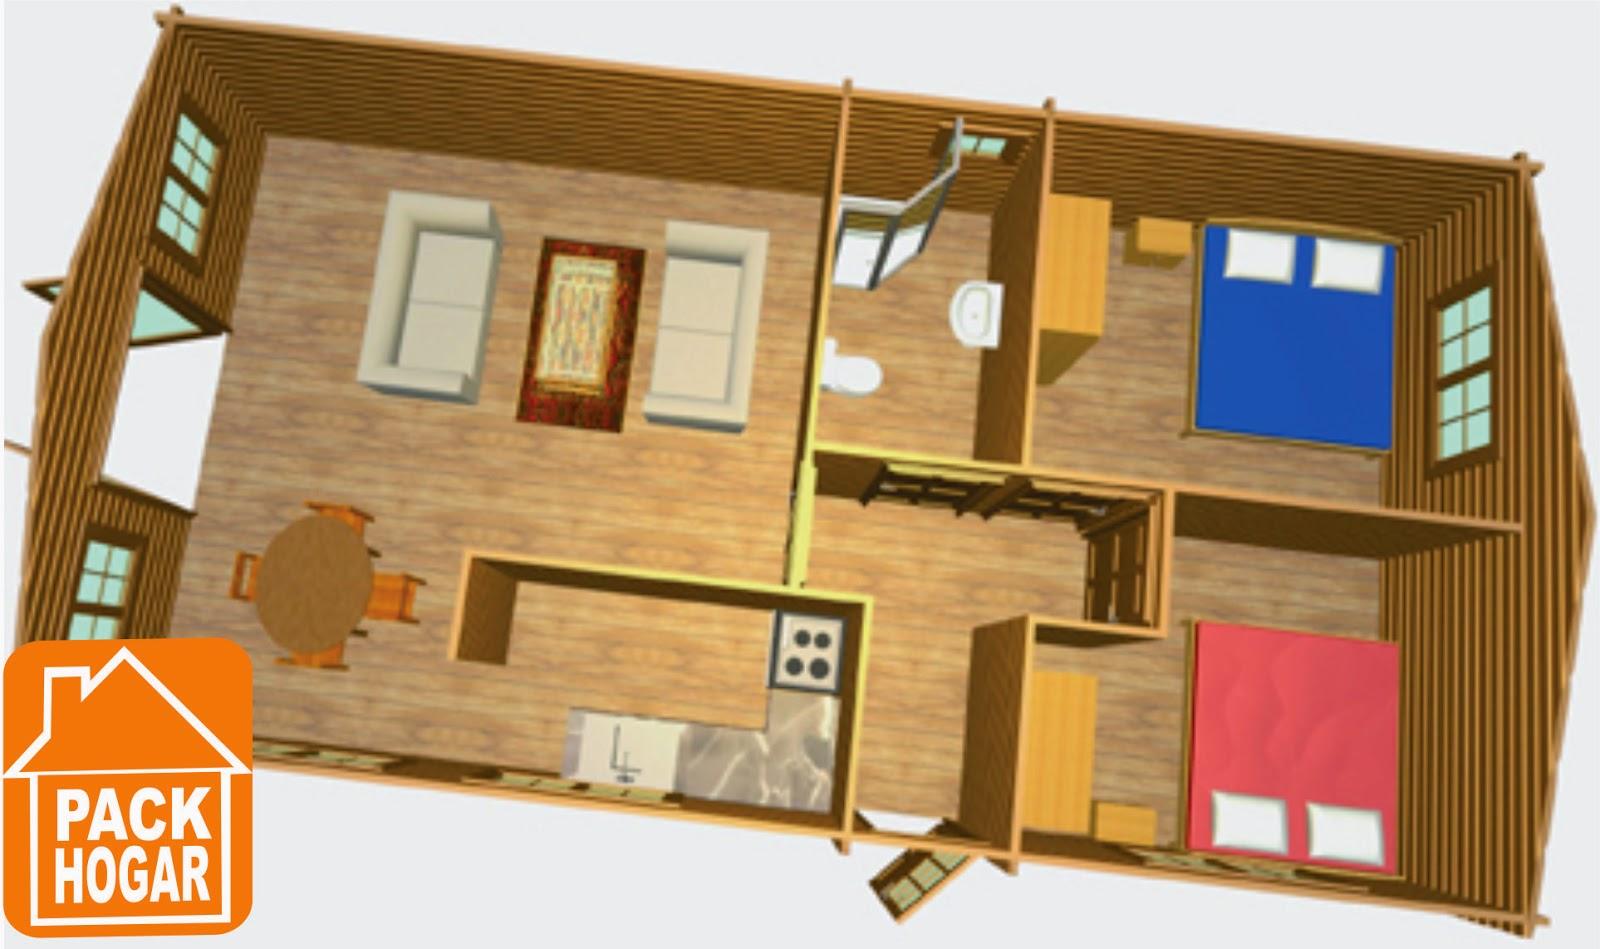 Casa de madera estonia 72m2 packhogar - Interiores de casas prefabricadas ...